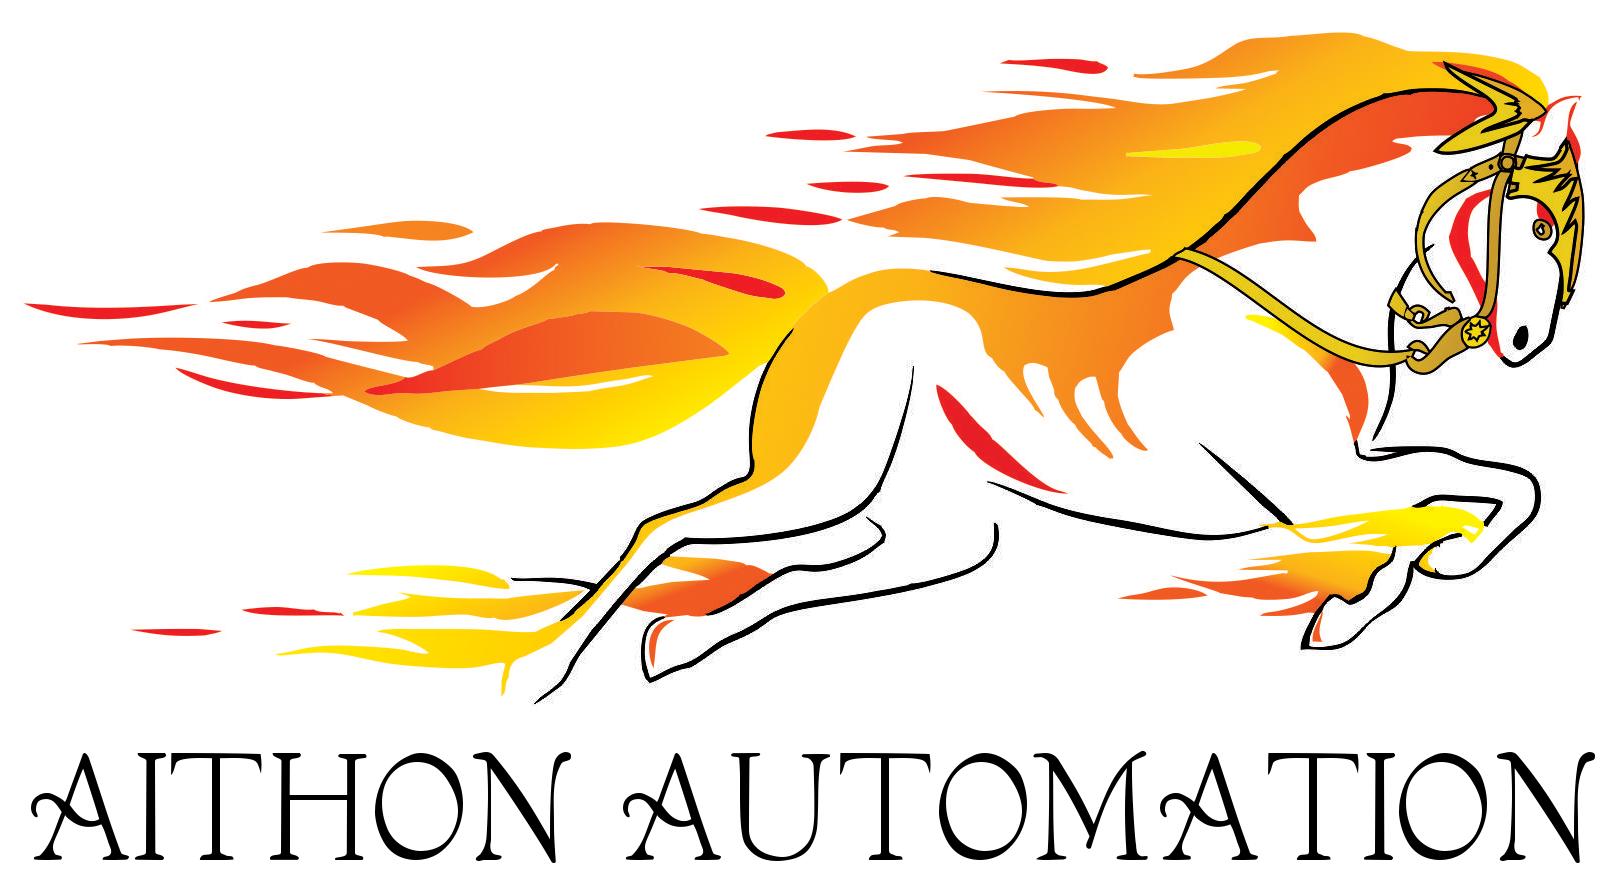 Aithon Automation